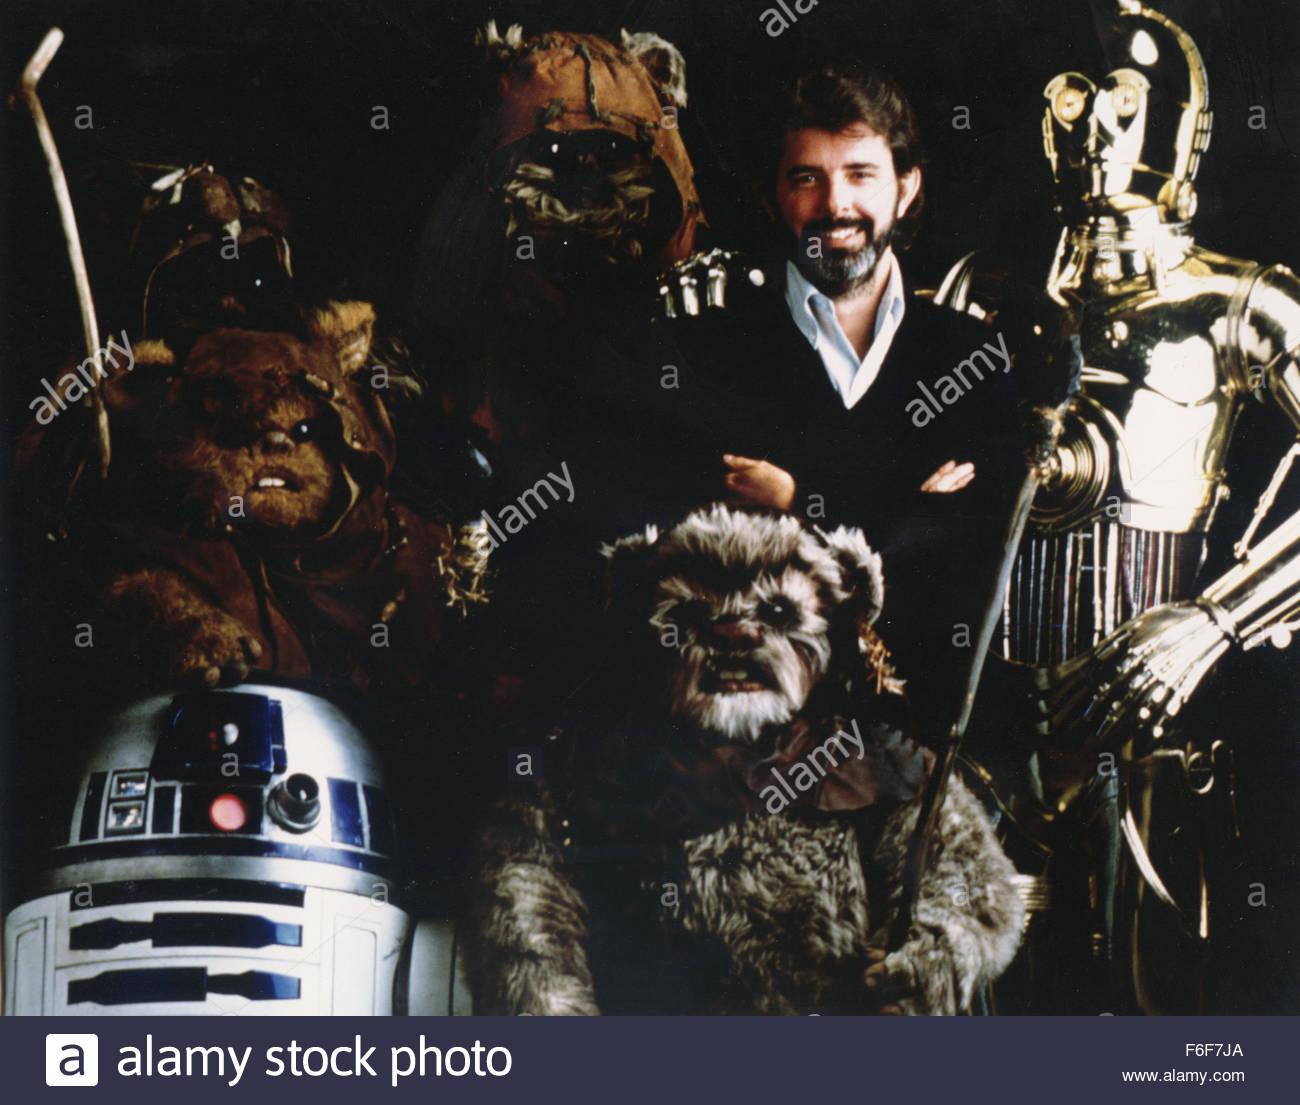 Star wars episode 6 release date in Melbourne